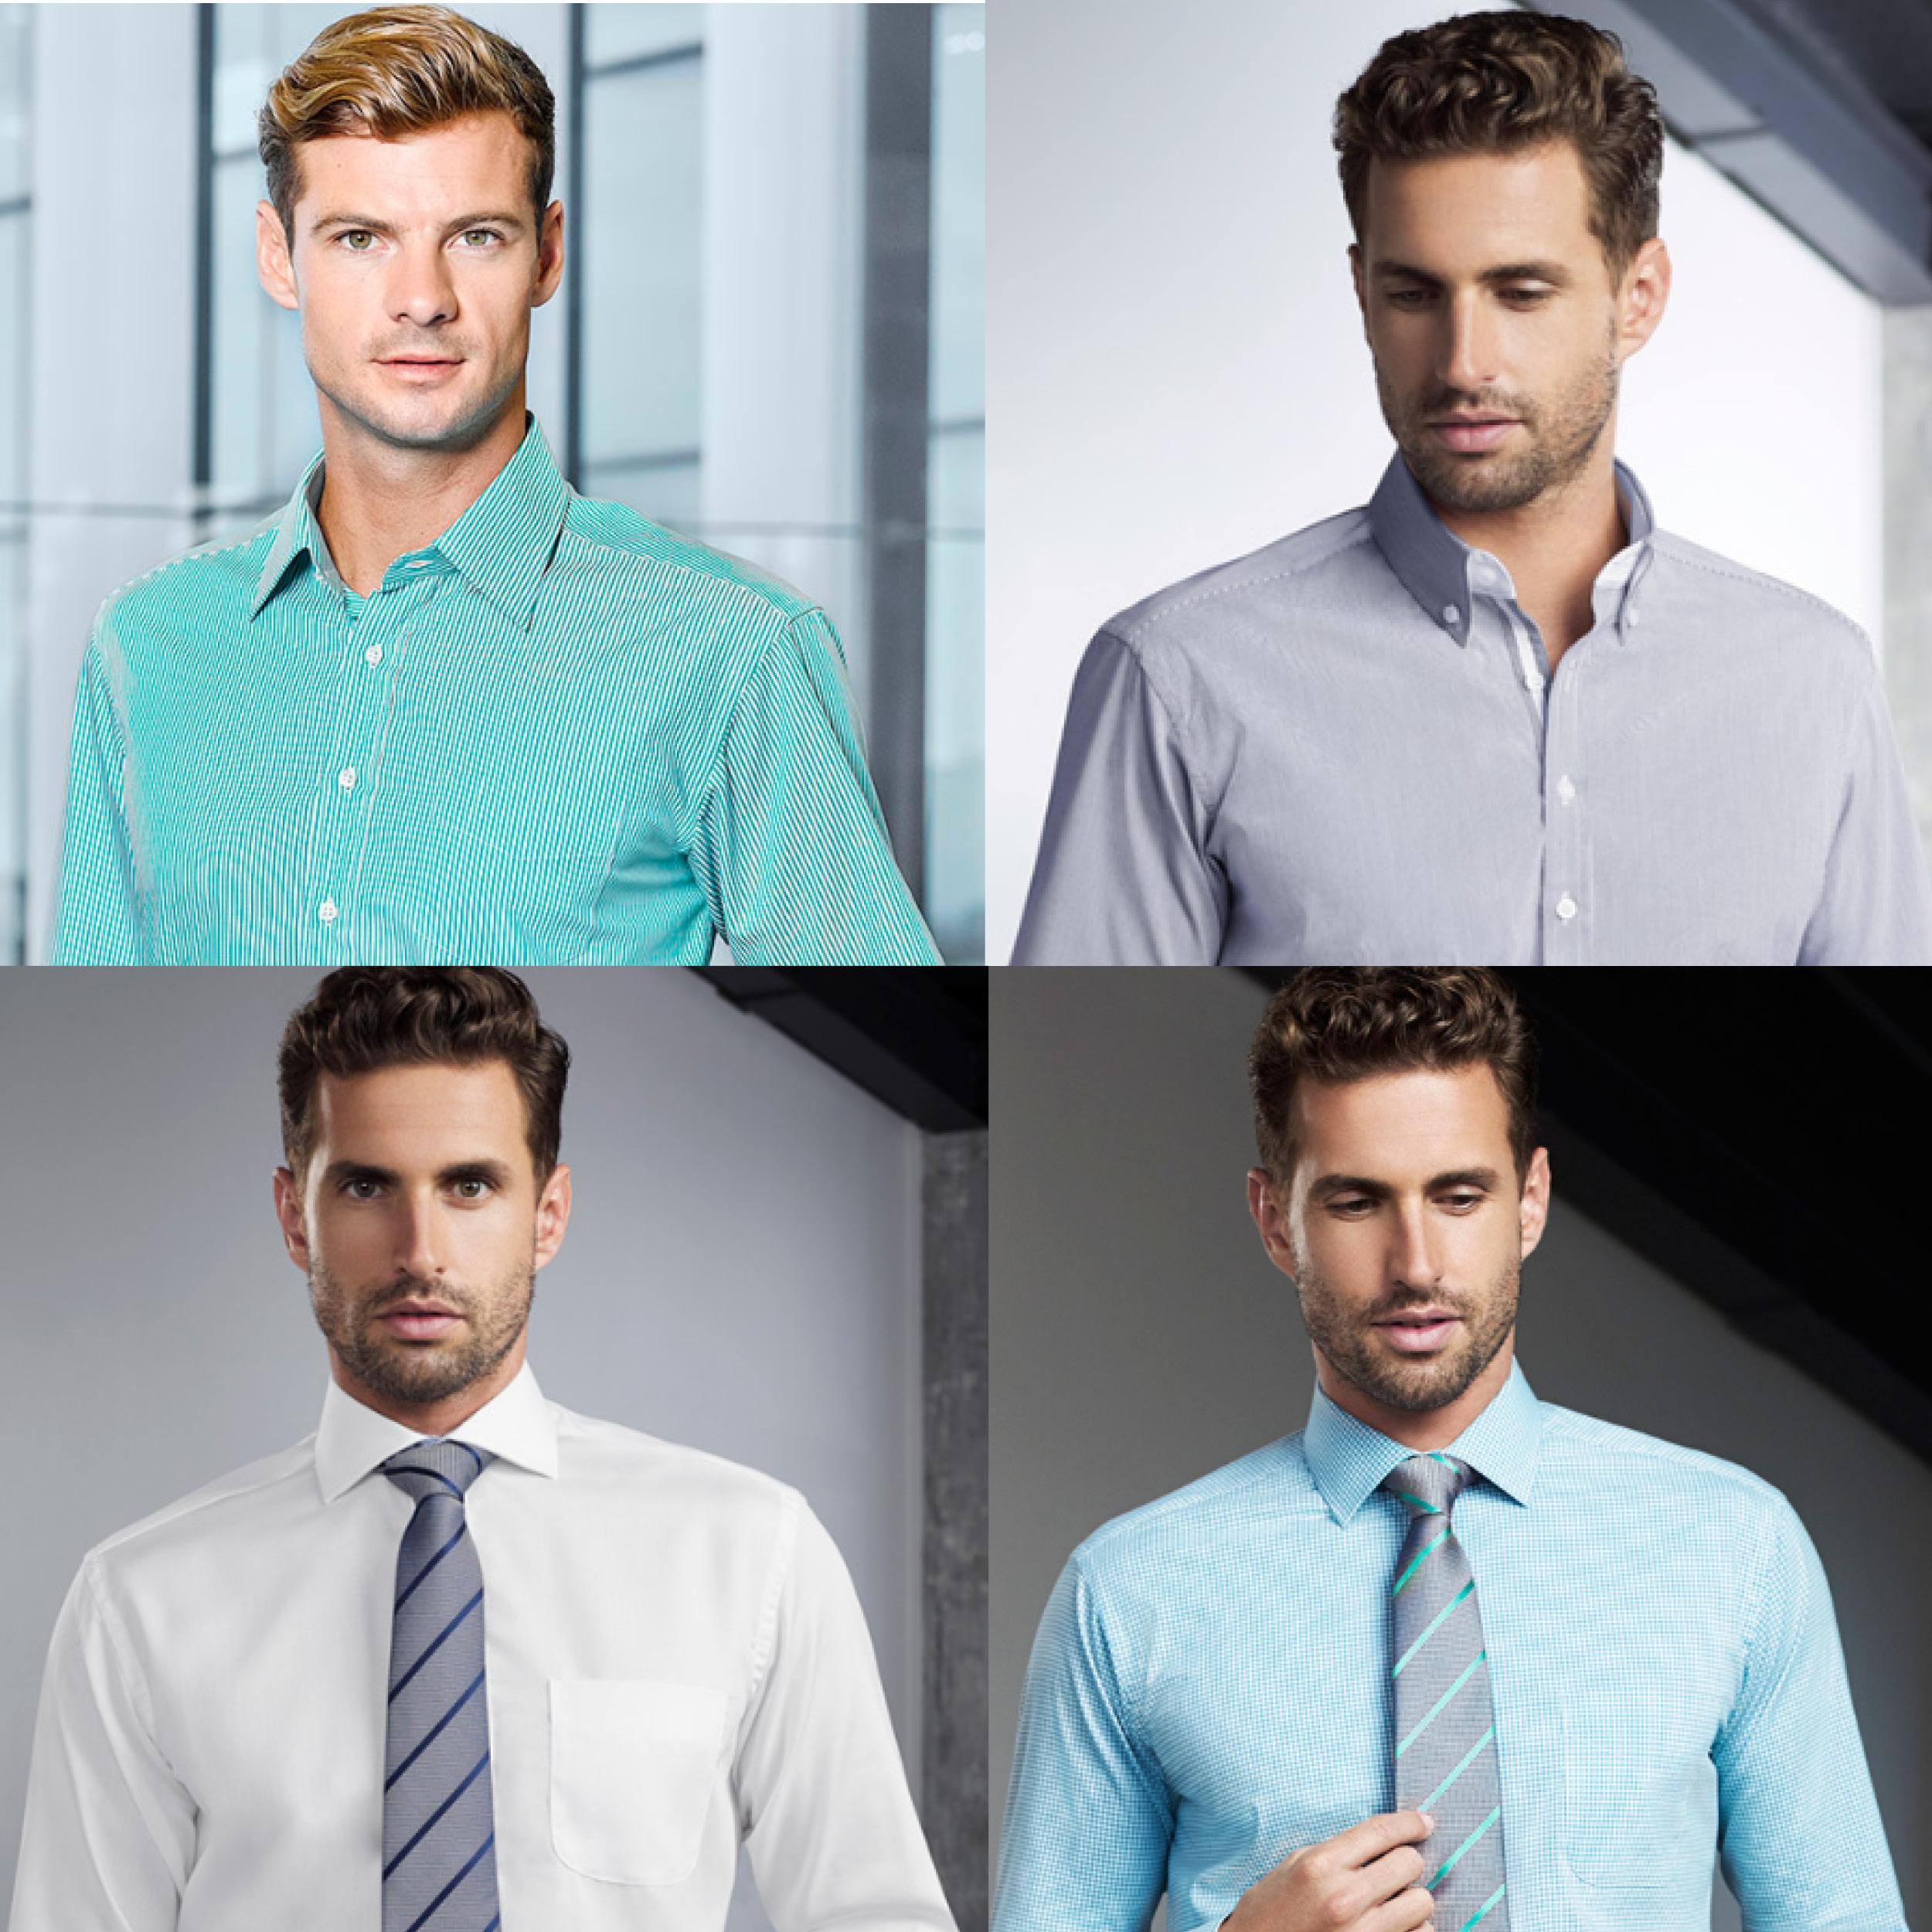 BIZ Corporates mens shirts